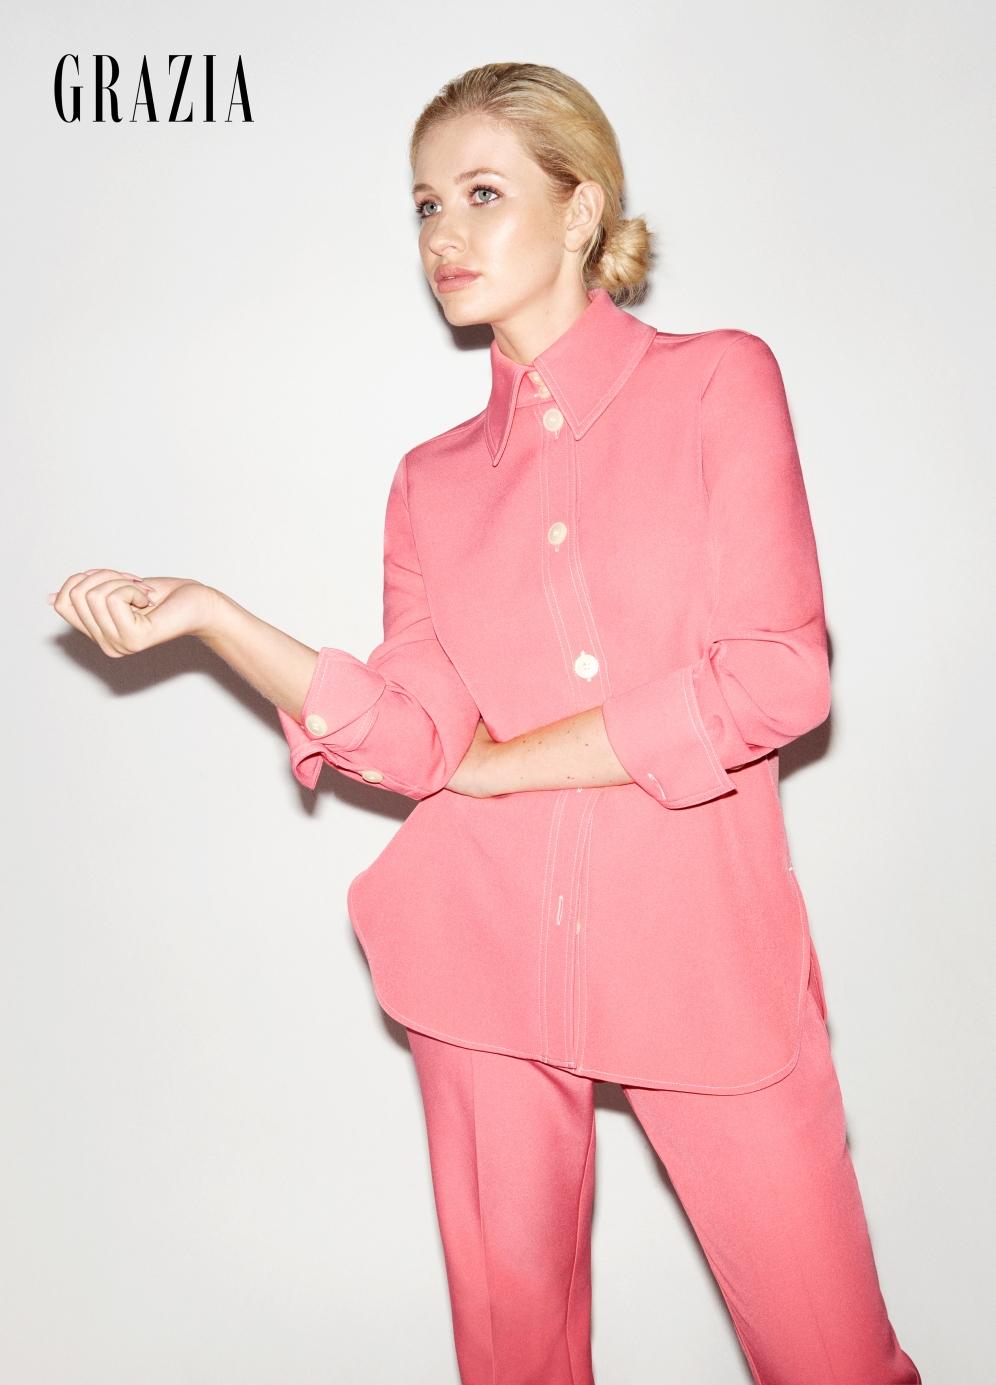 Amy Hart | Grazia